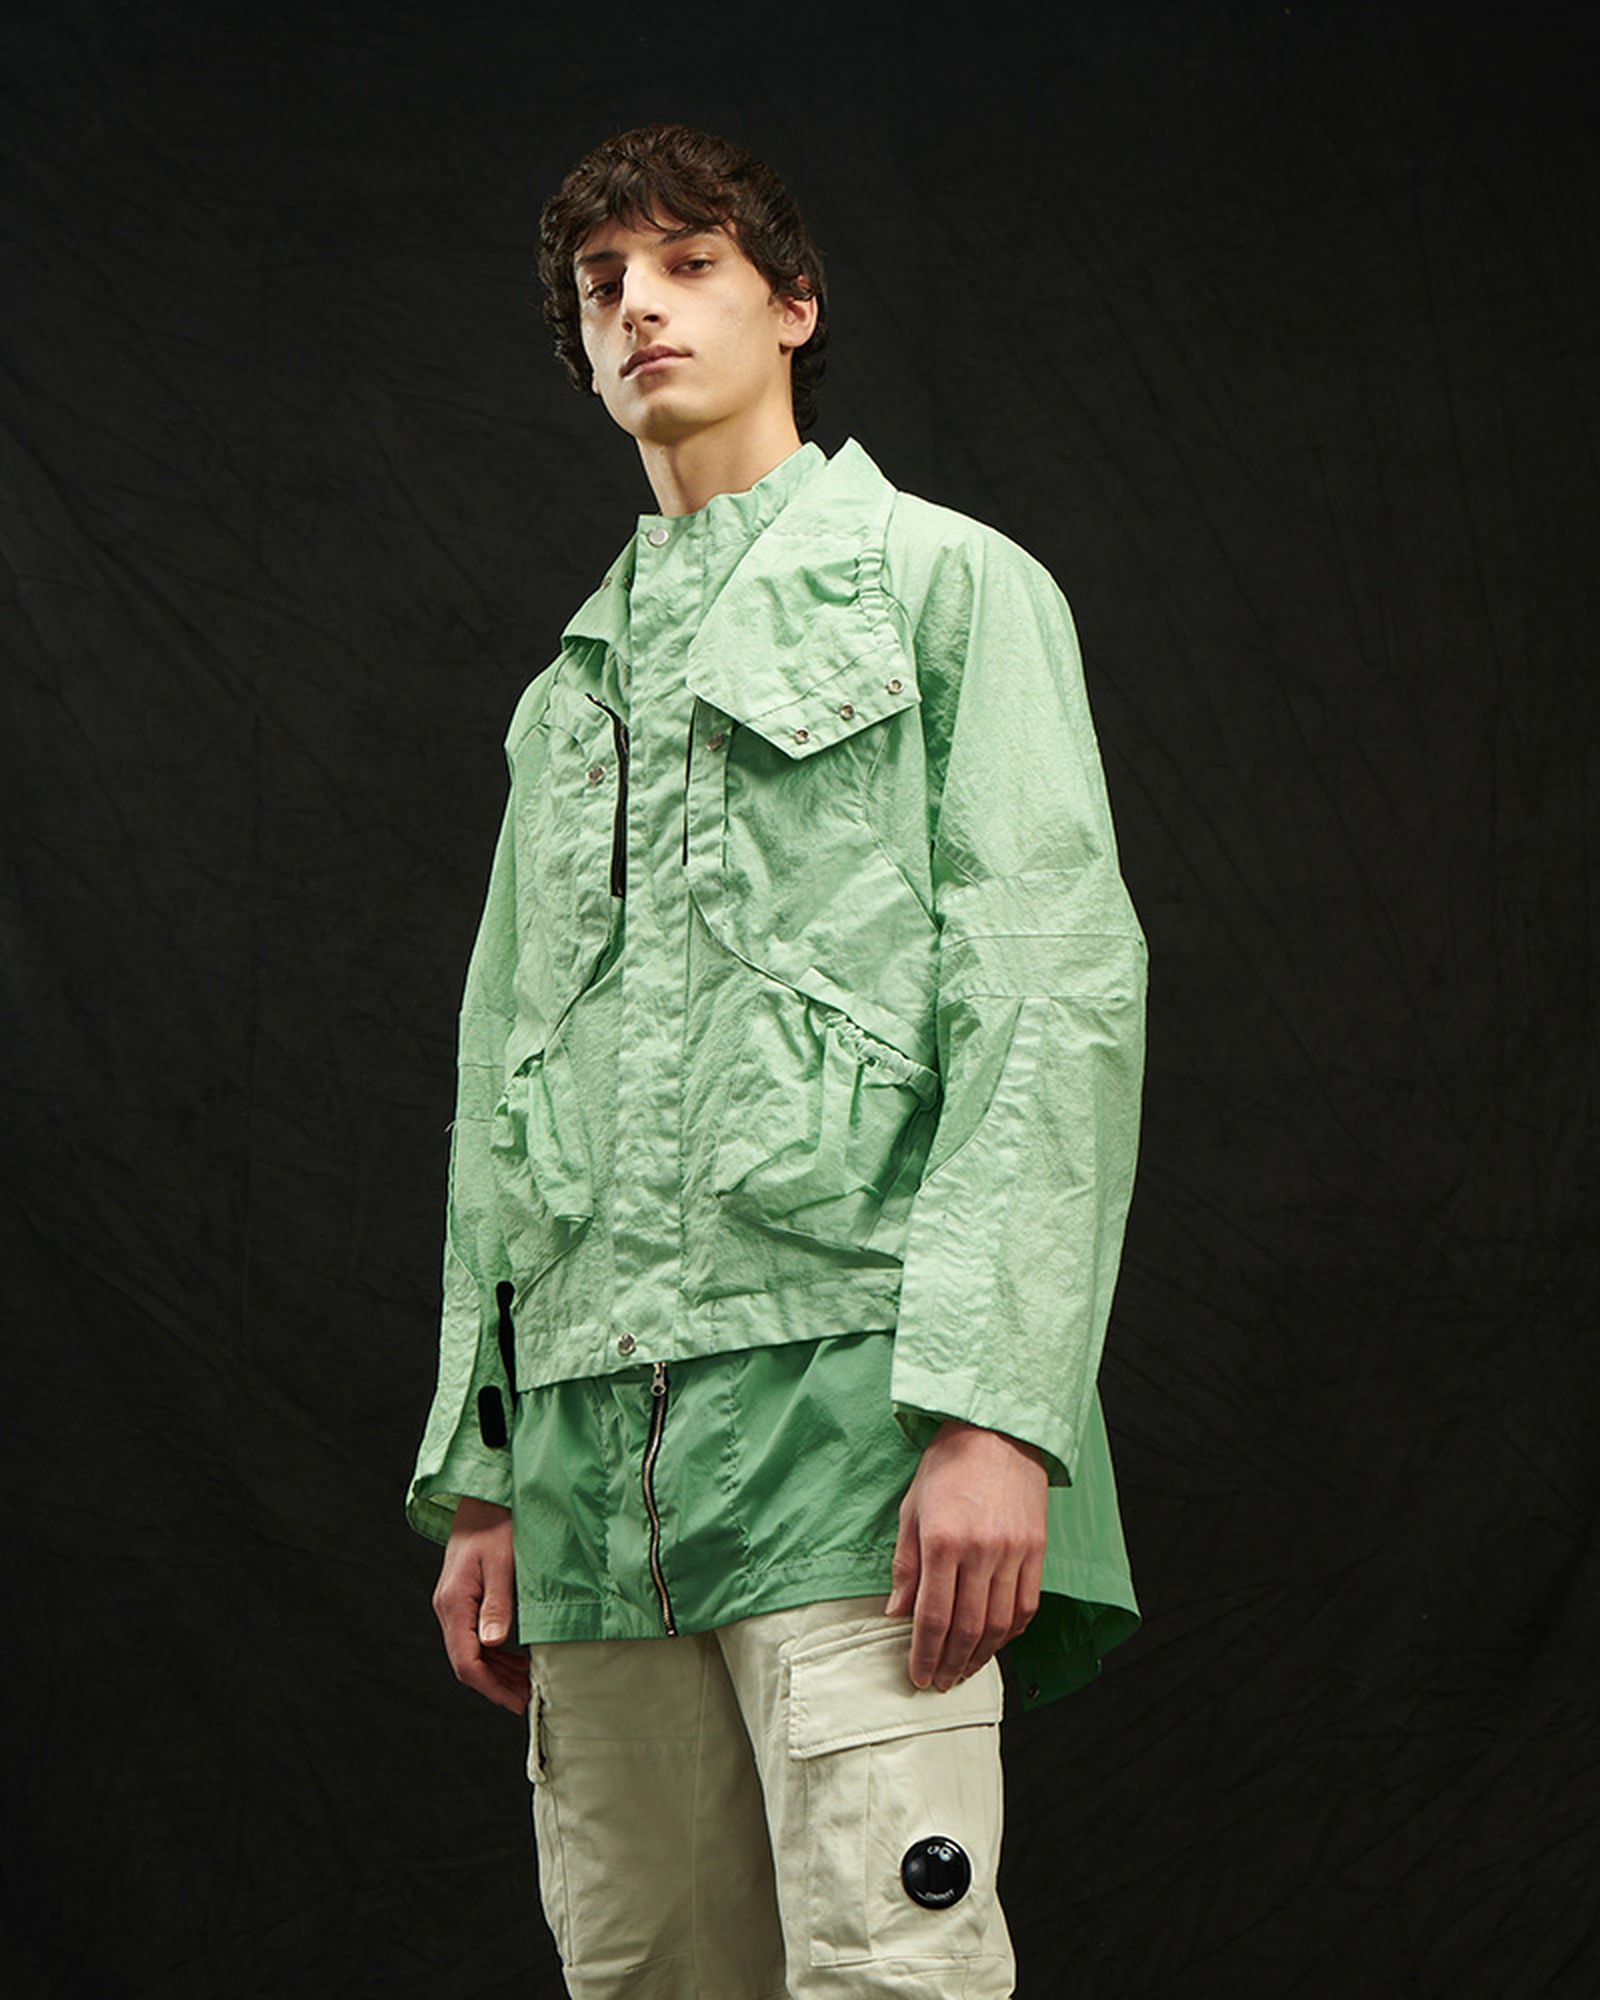 kiko-kosta-cp-company-jacket-details-on-model-01